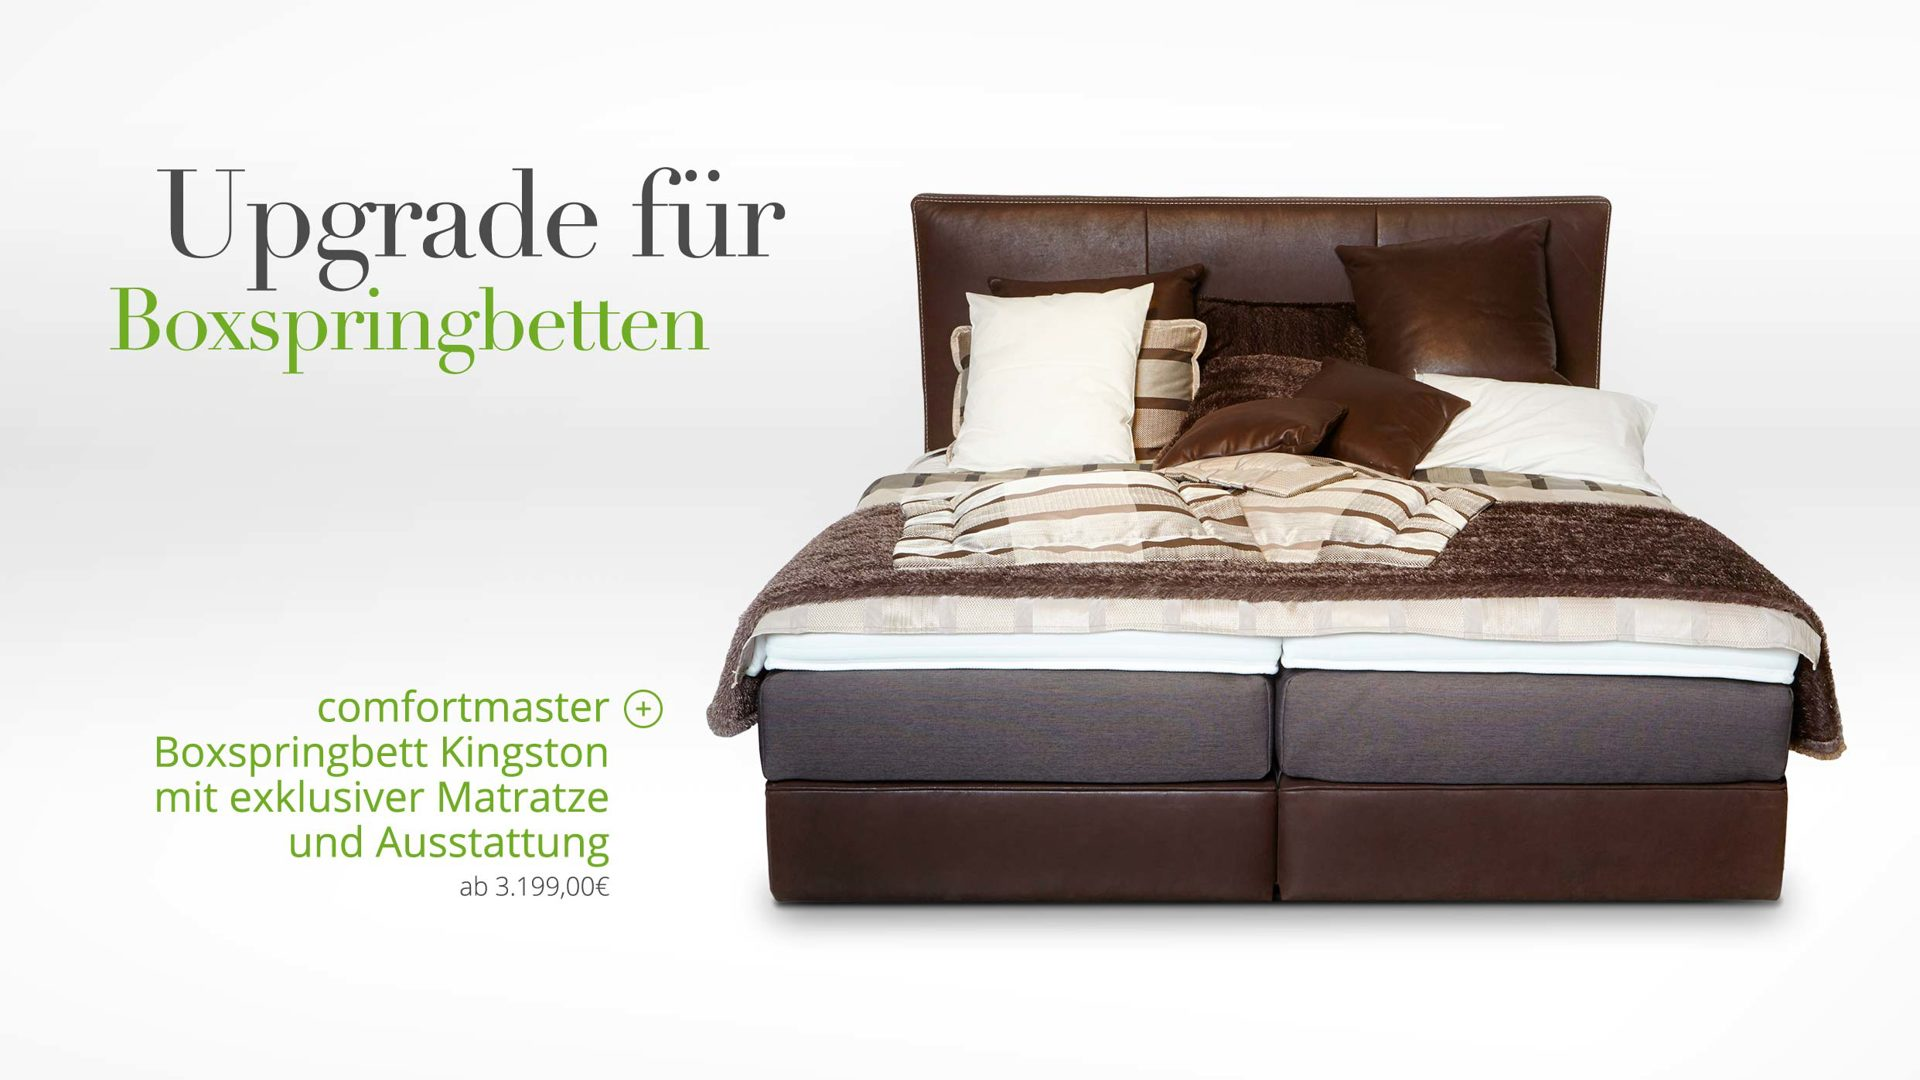 Möbel Boer Coesfeld, DeRoyce, Comfortmaster, Interliving